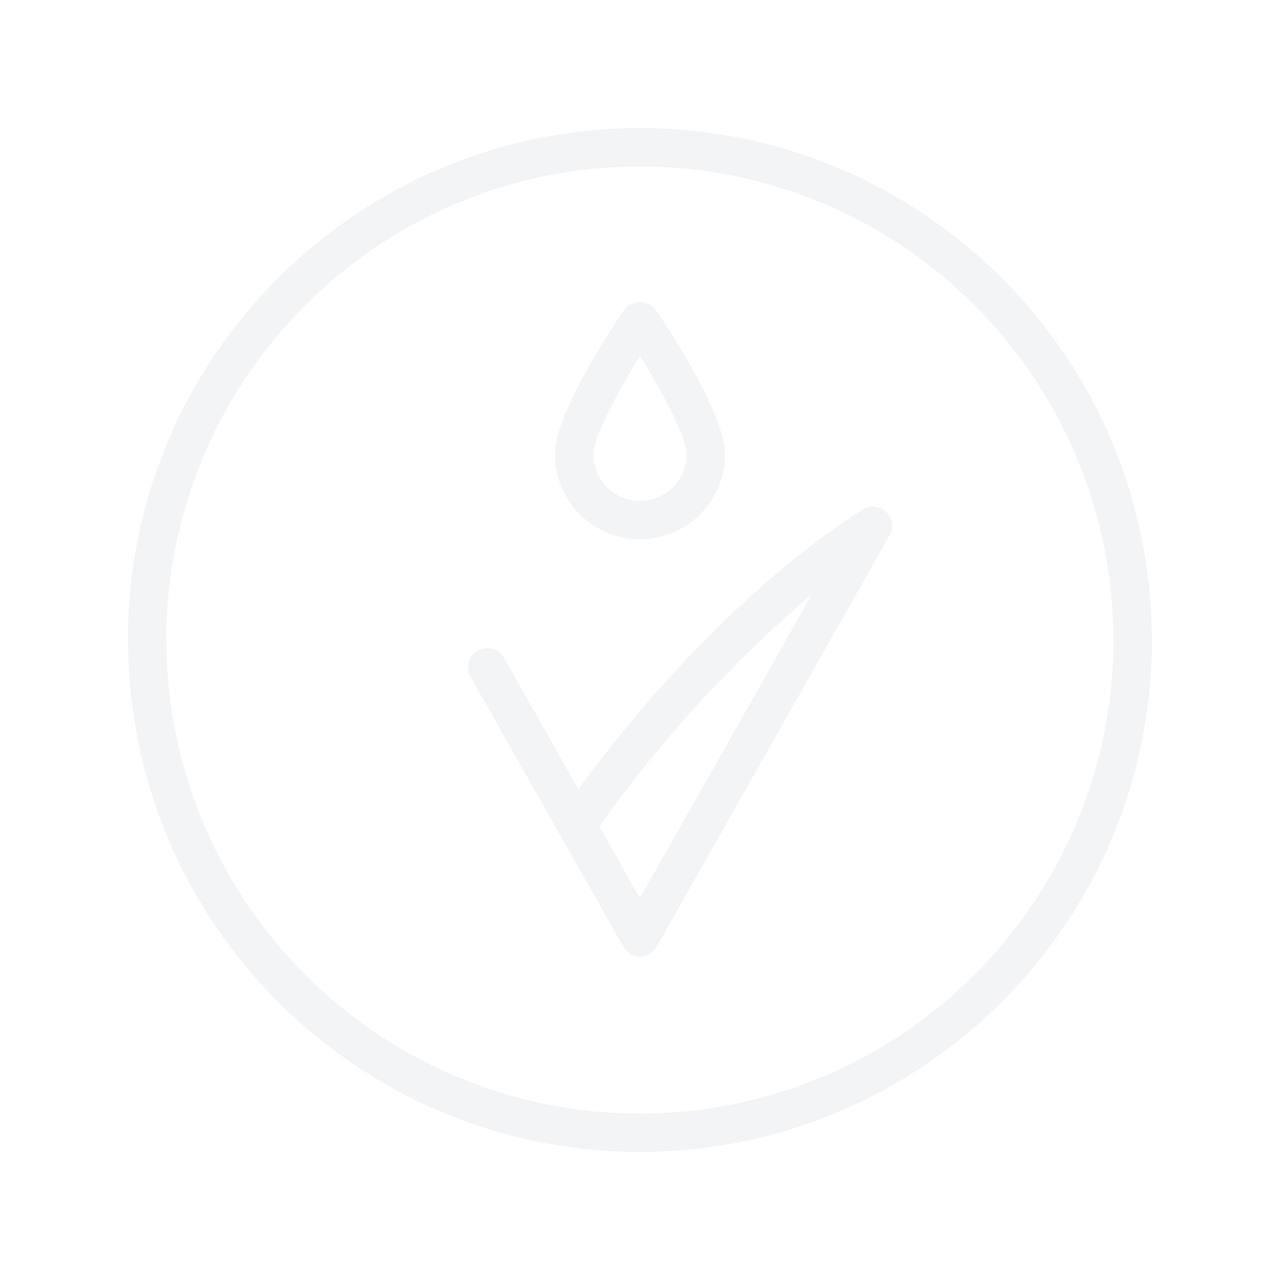 TAHE Lipomit Frambuesa & Jasmin Hand Cream 75ml